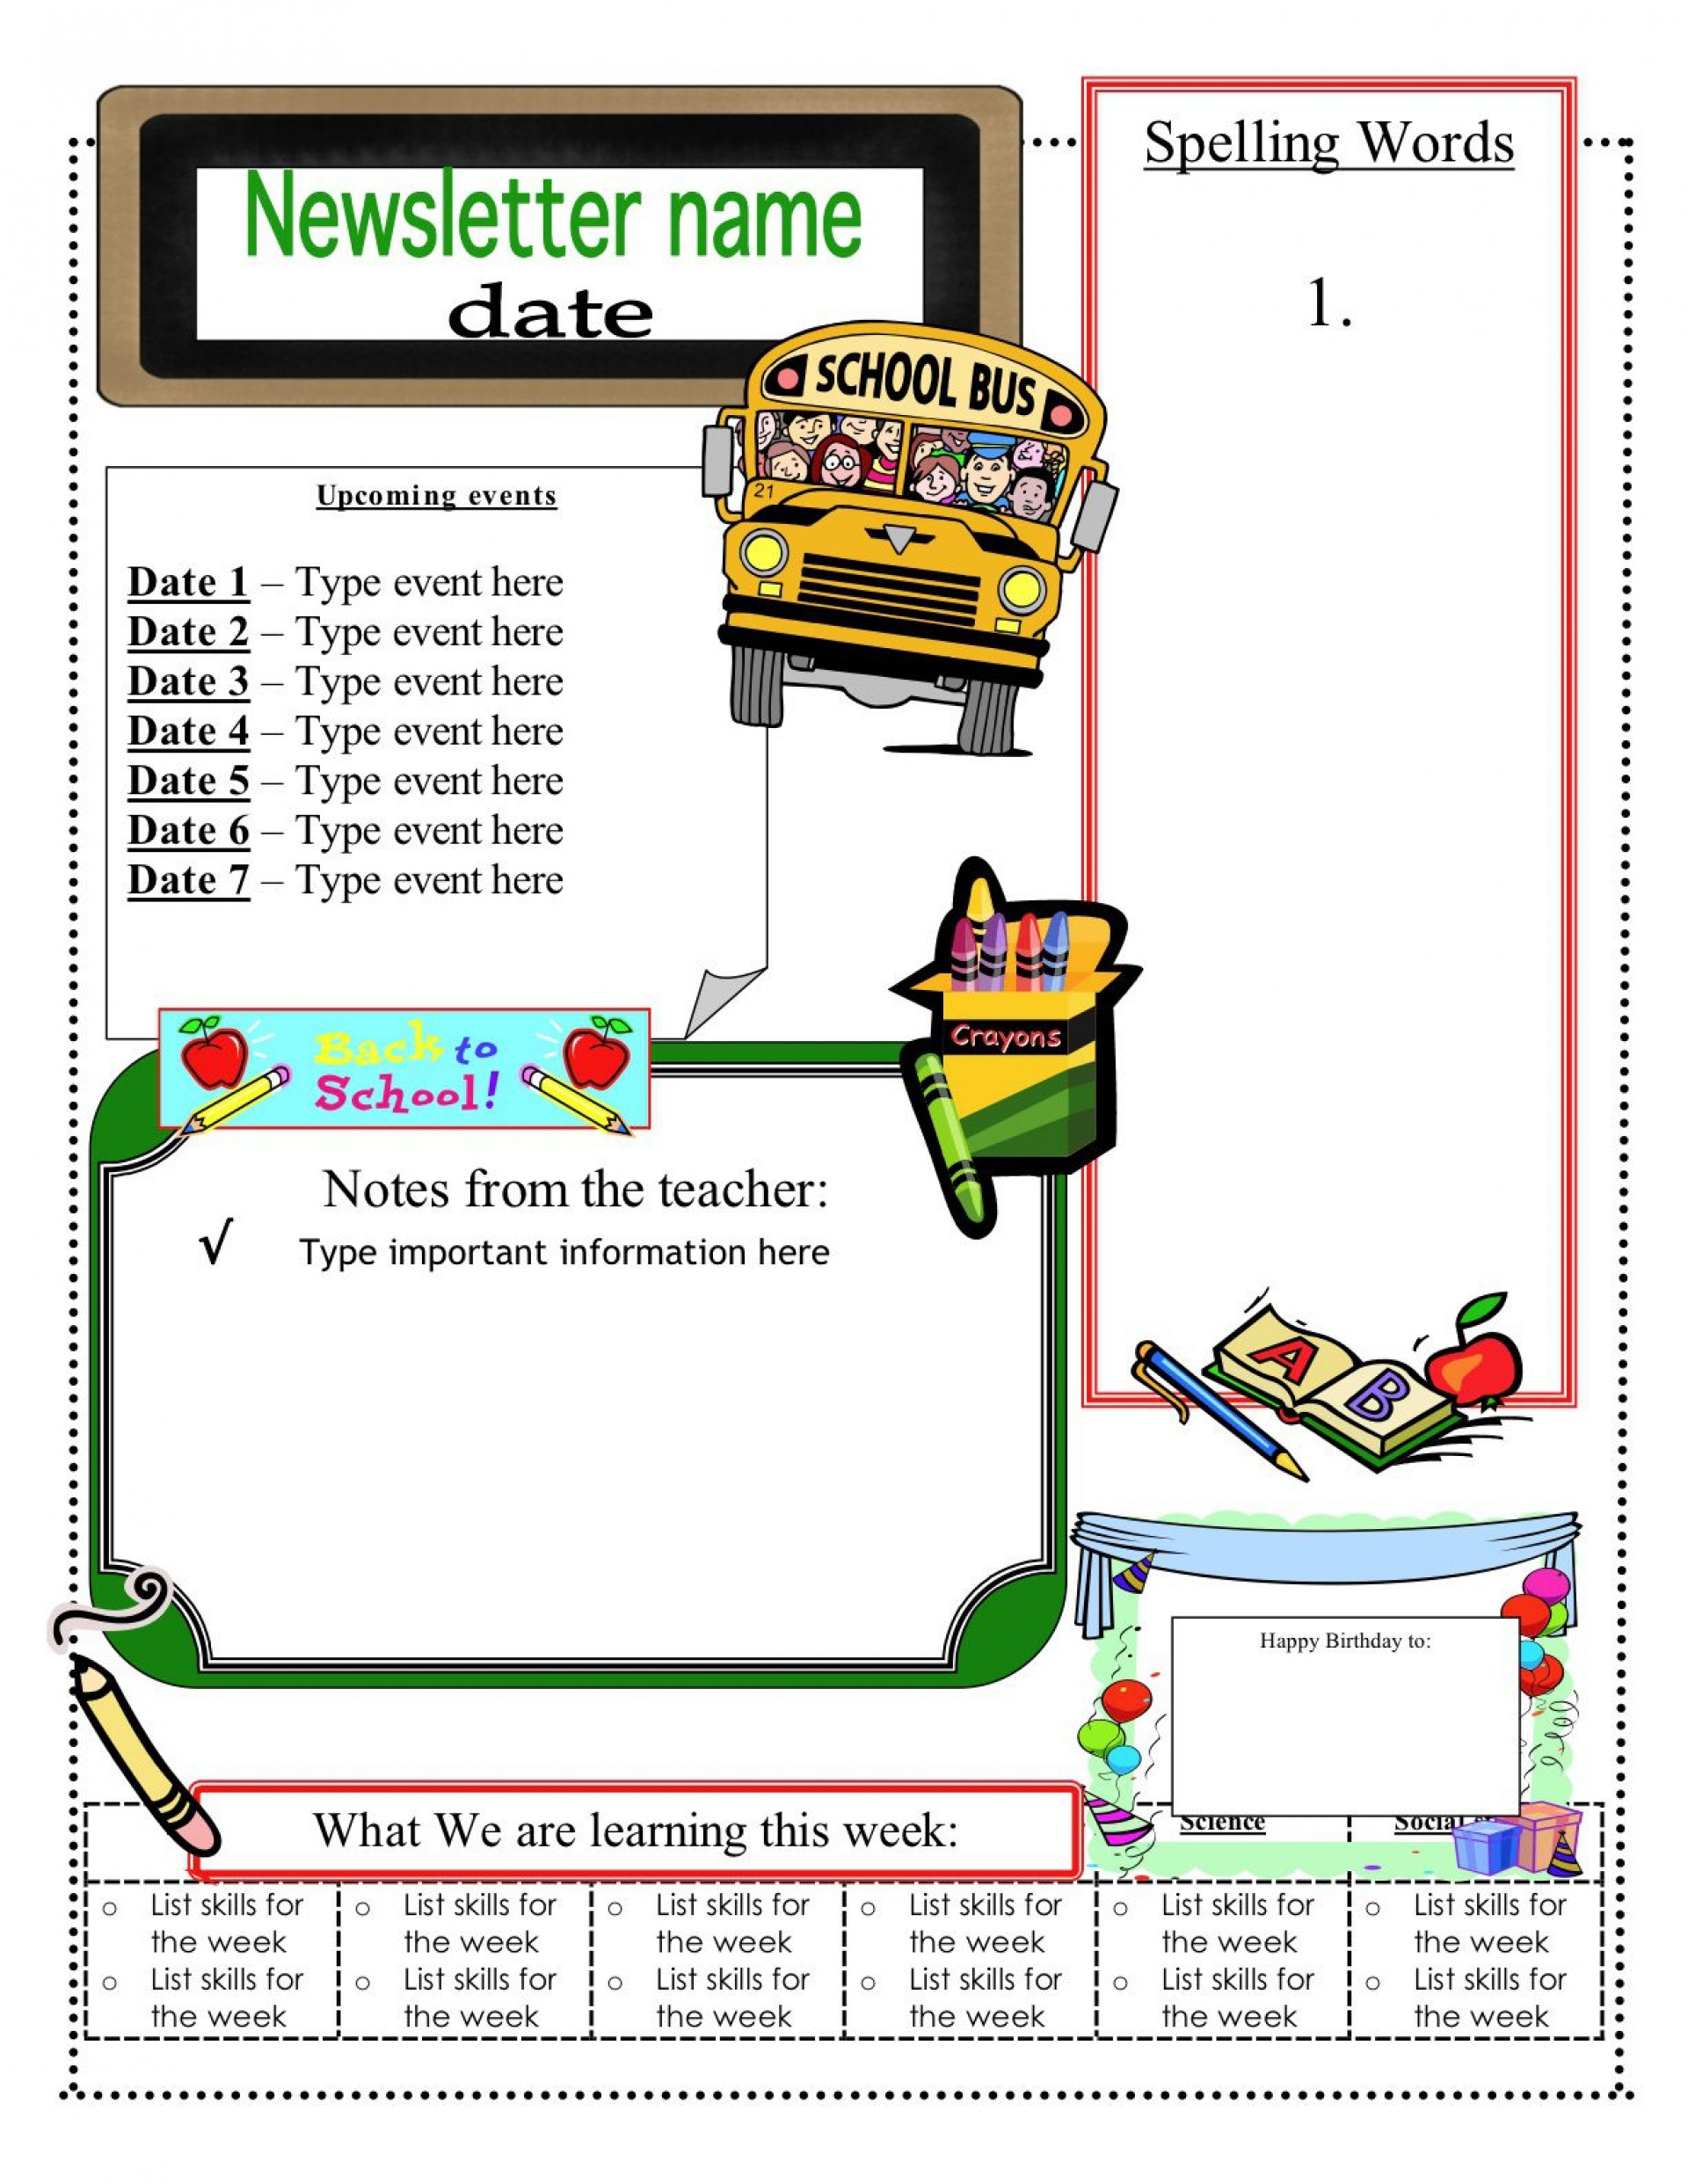 001 Best Newsletter Template For Teacher Sample  Teachers To Parent Printable Free School1920